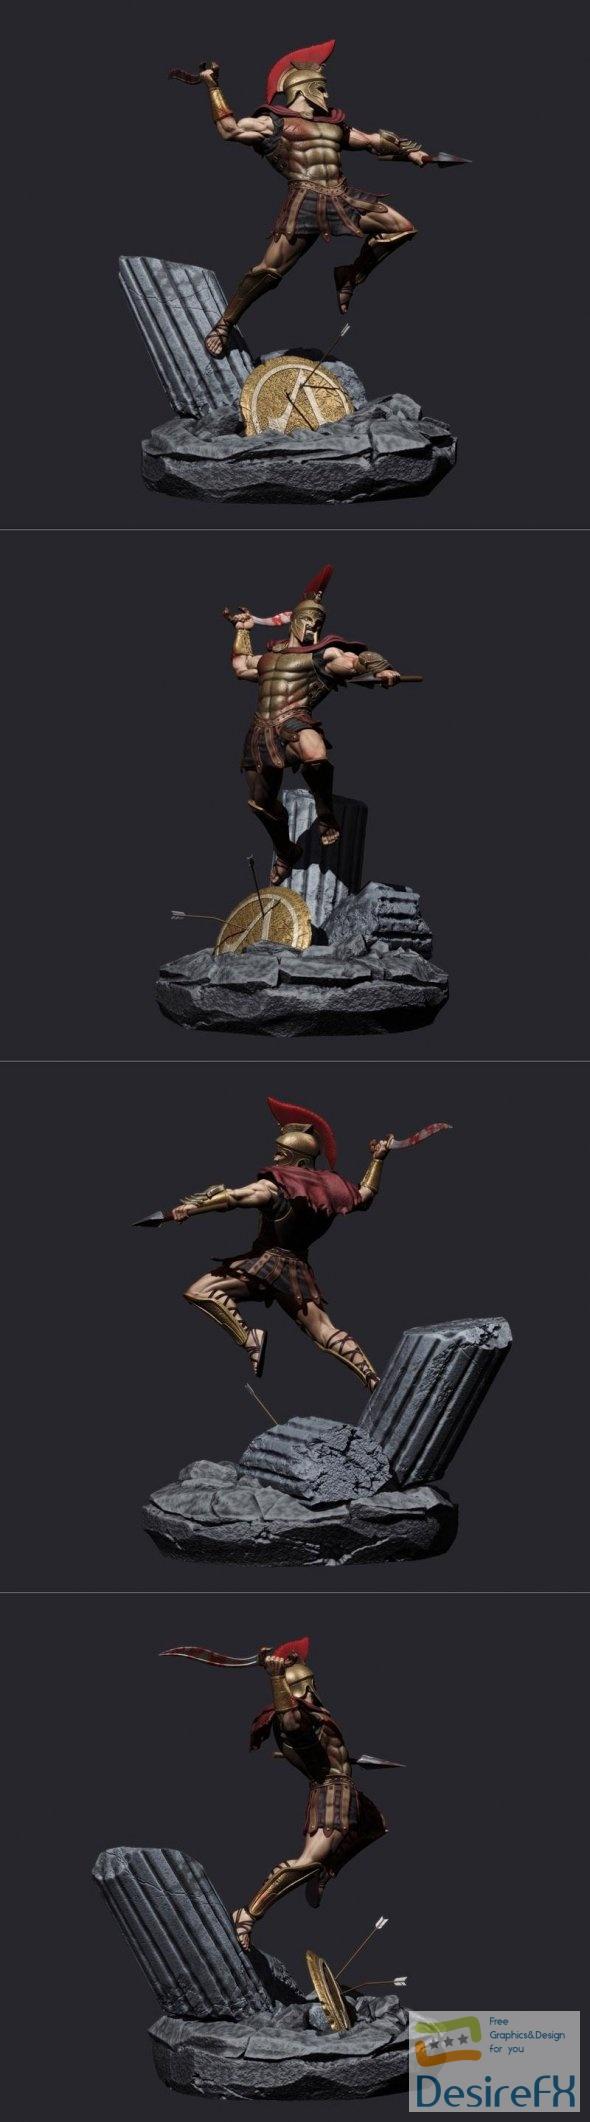 Assassins Creed Odyssey Custom 3D Print